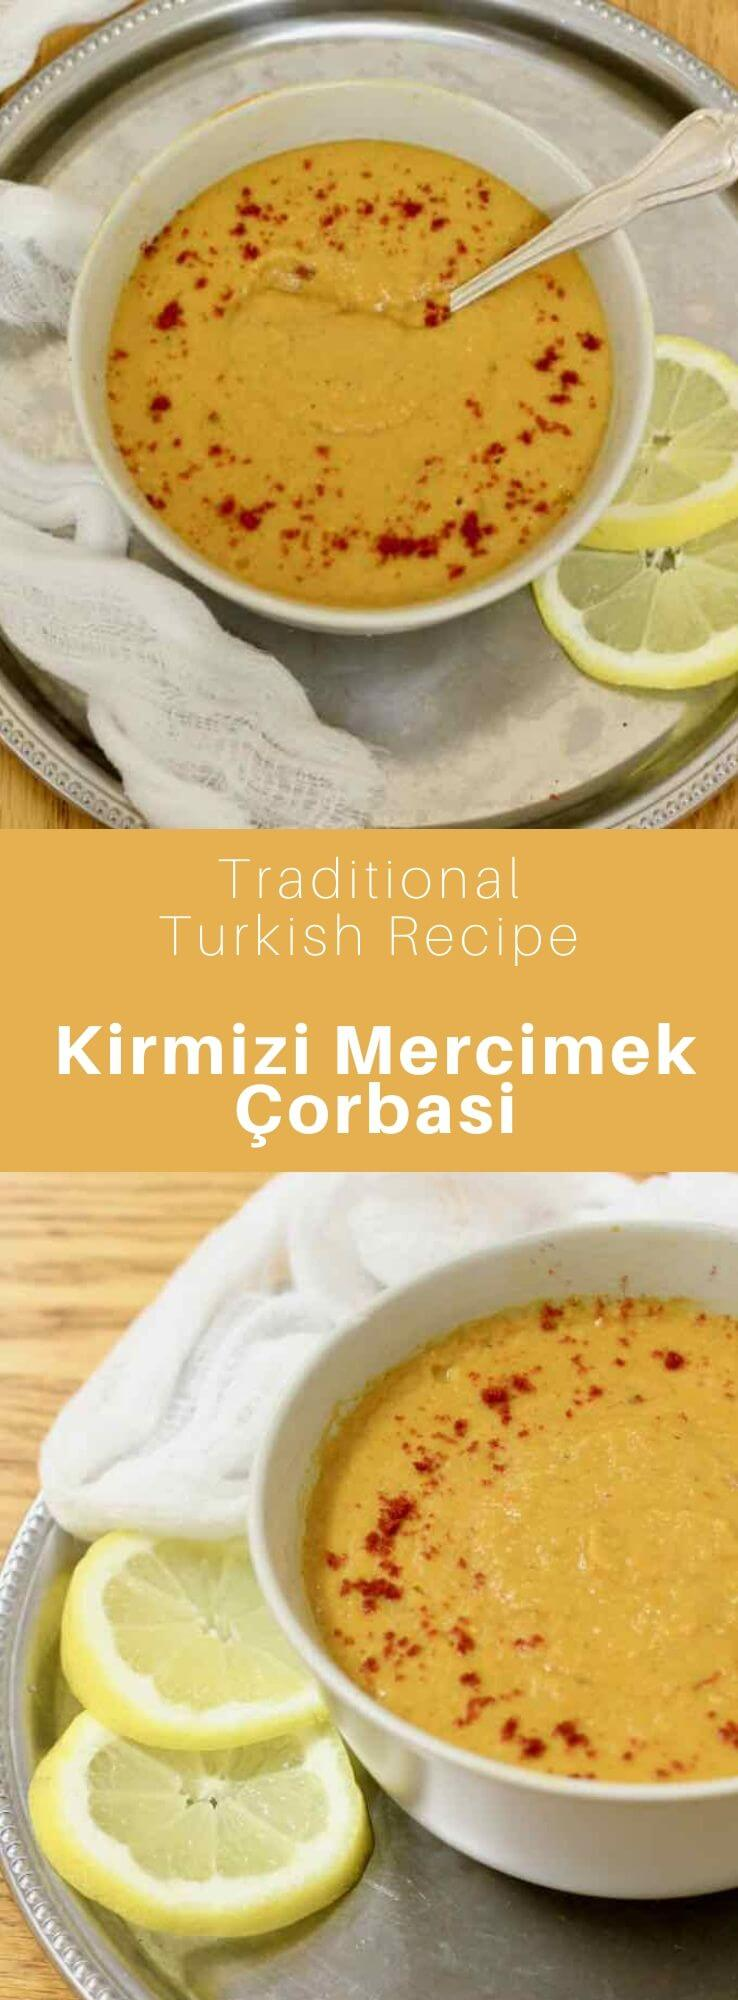 Kırmızı mercimek çorbası is a delicious and velvety red lentil soup that is traditional of Turkish cuisine. #Turkey #Turkish #TurkishRecipe #TurkishFood #TurkishCuisine #WorldCuisine #196flavors